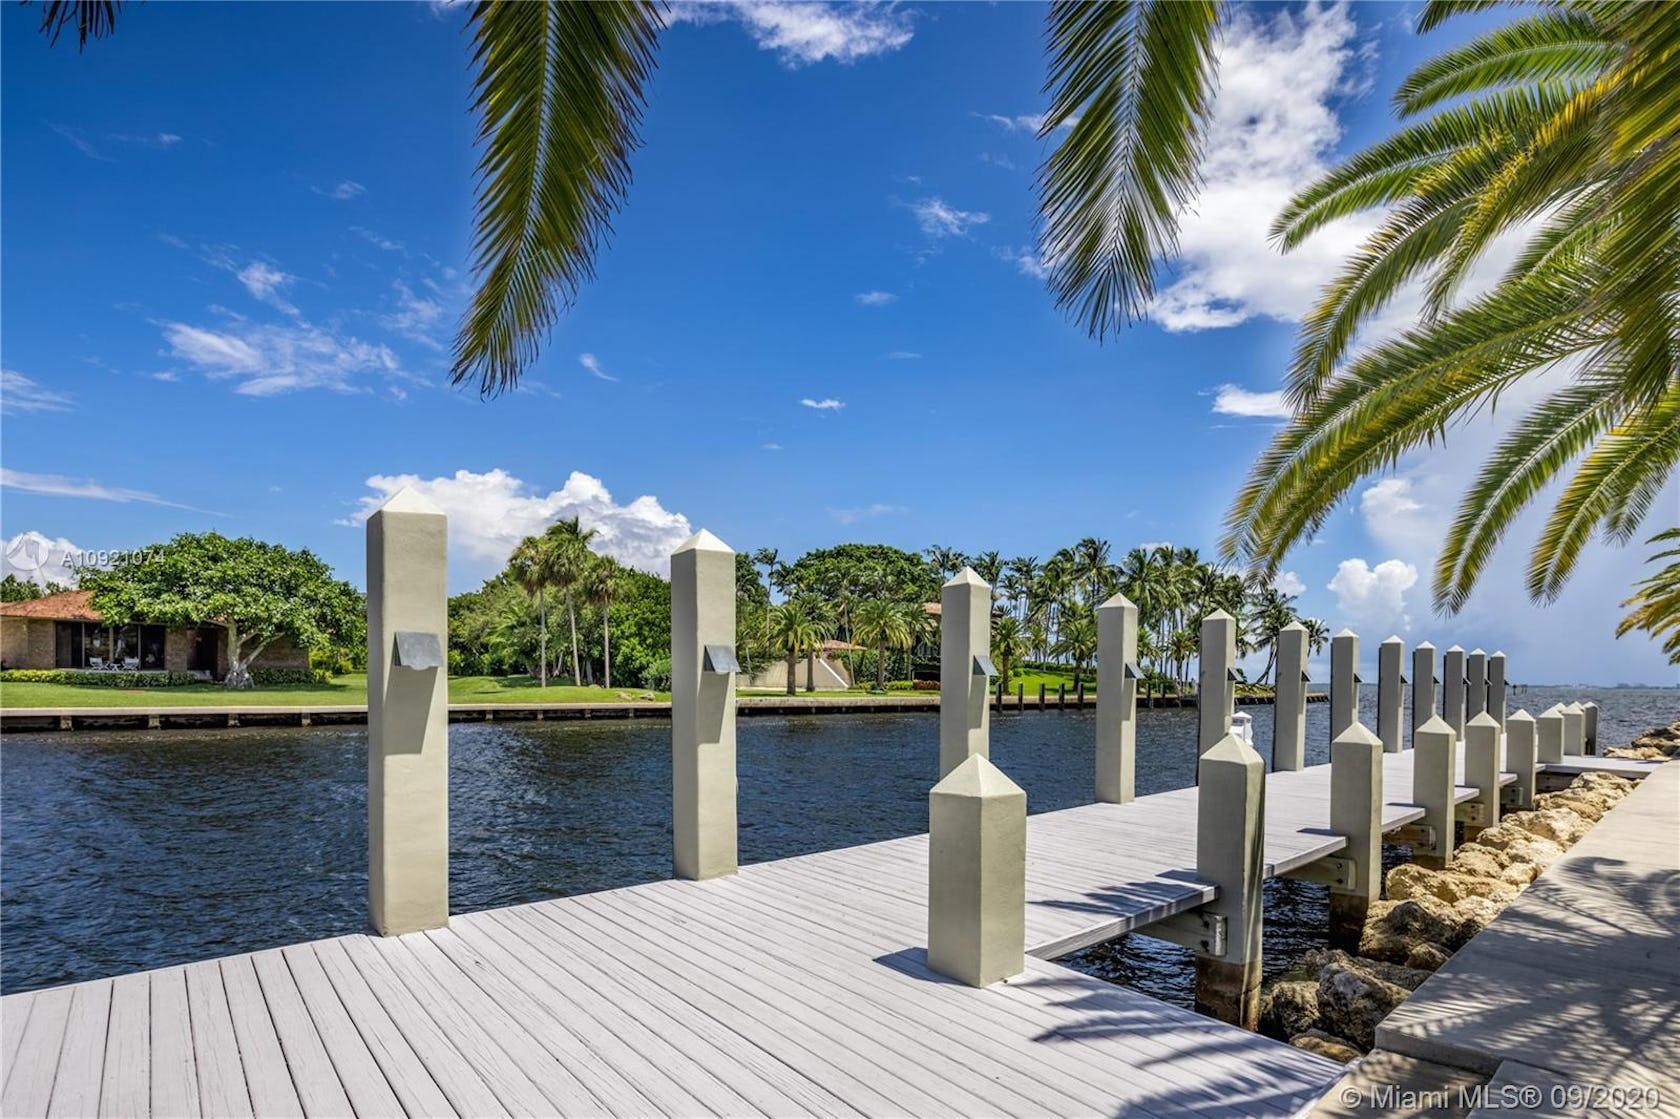 water railing waterfront porch pier dock port summer